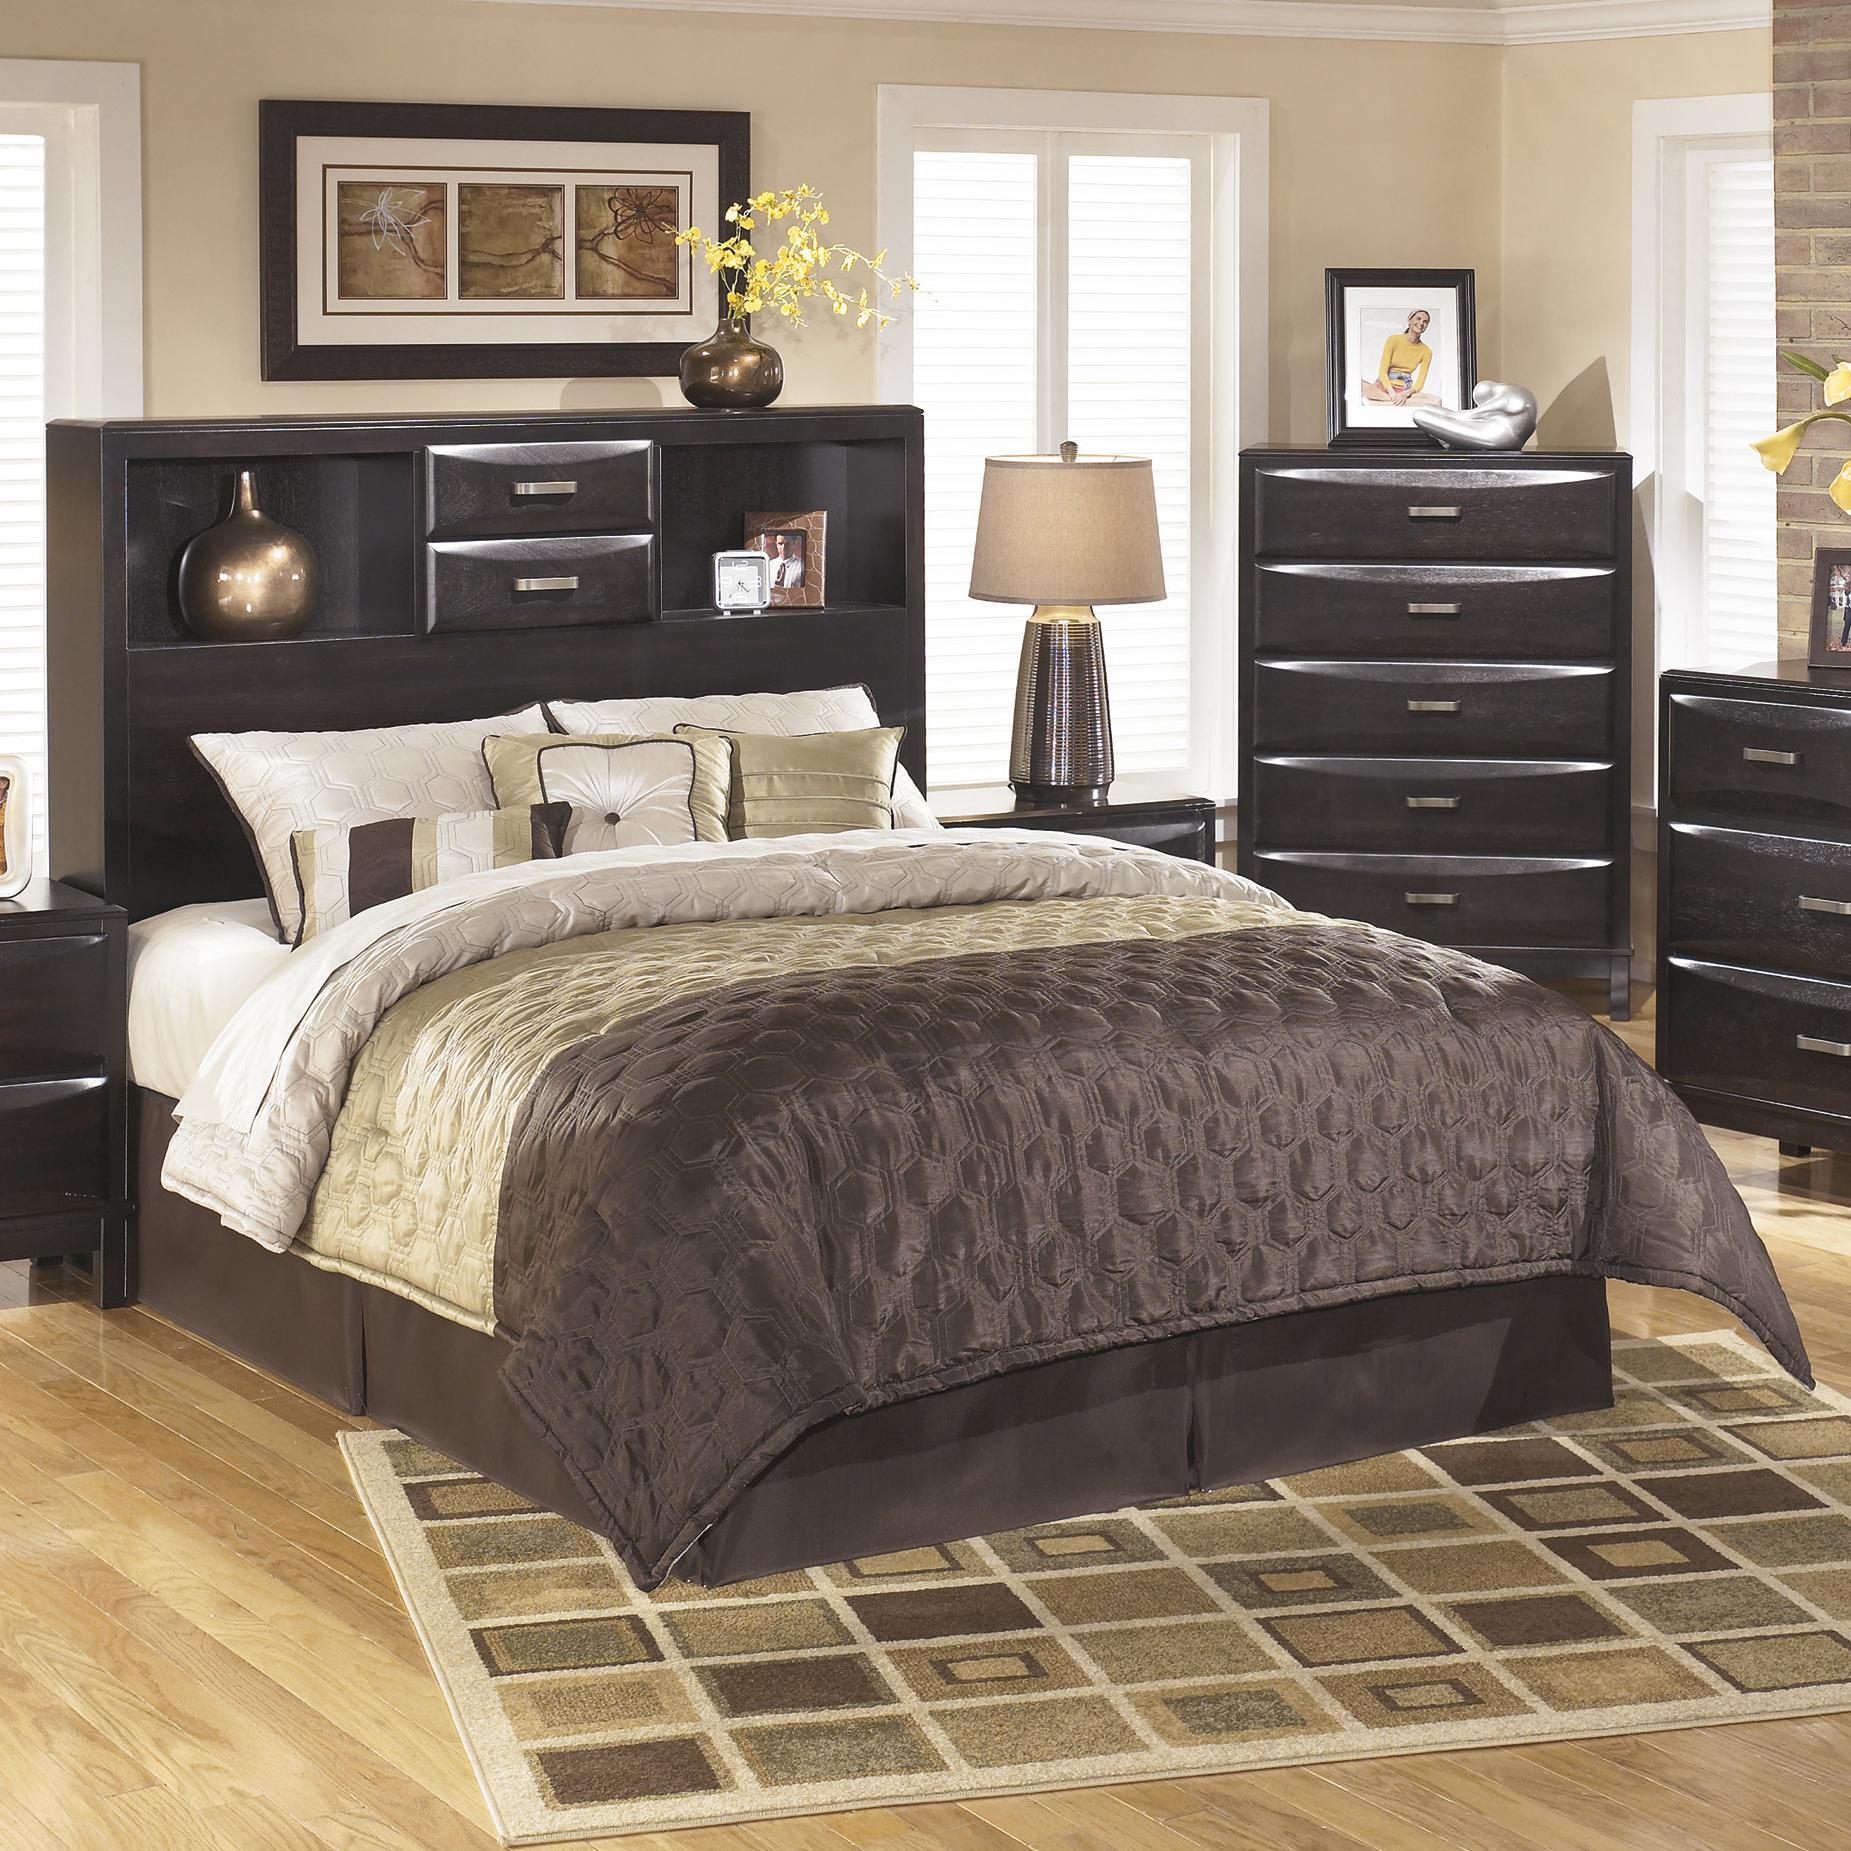 Ashley Furniture Kira King Cal King Storage Headboard